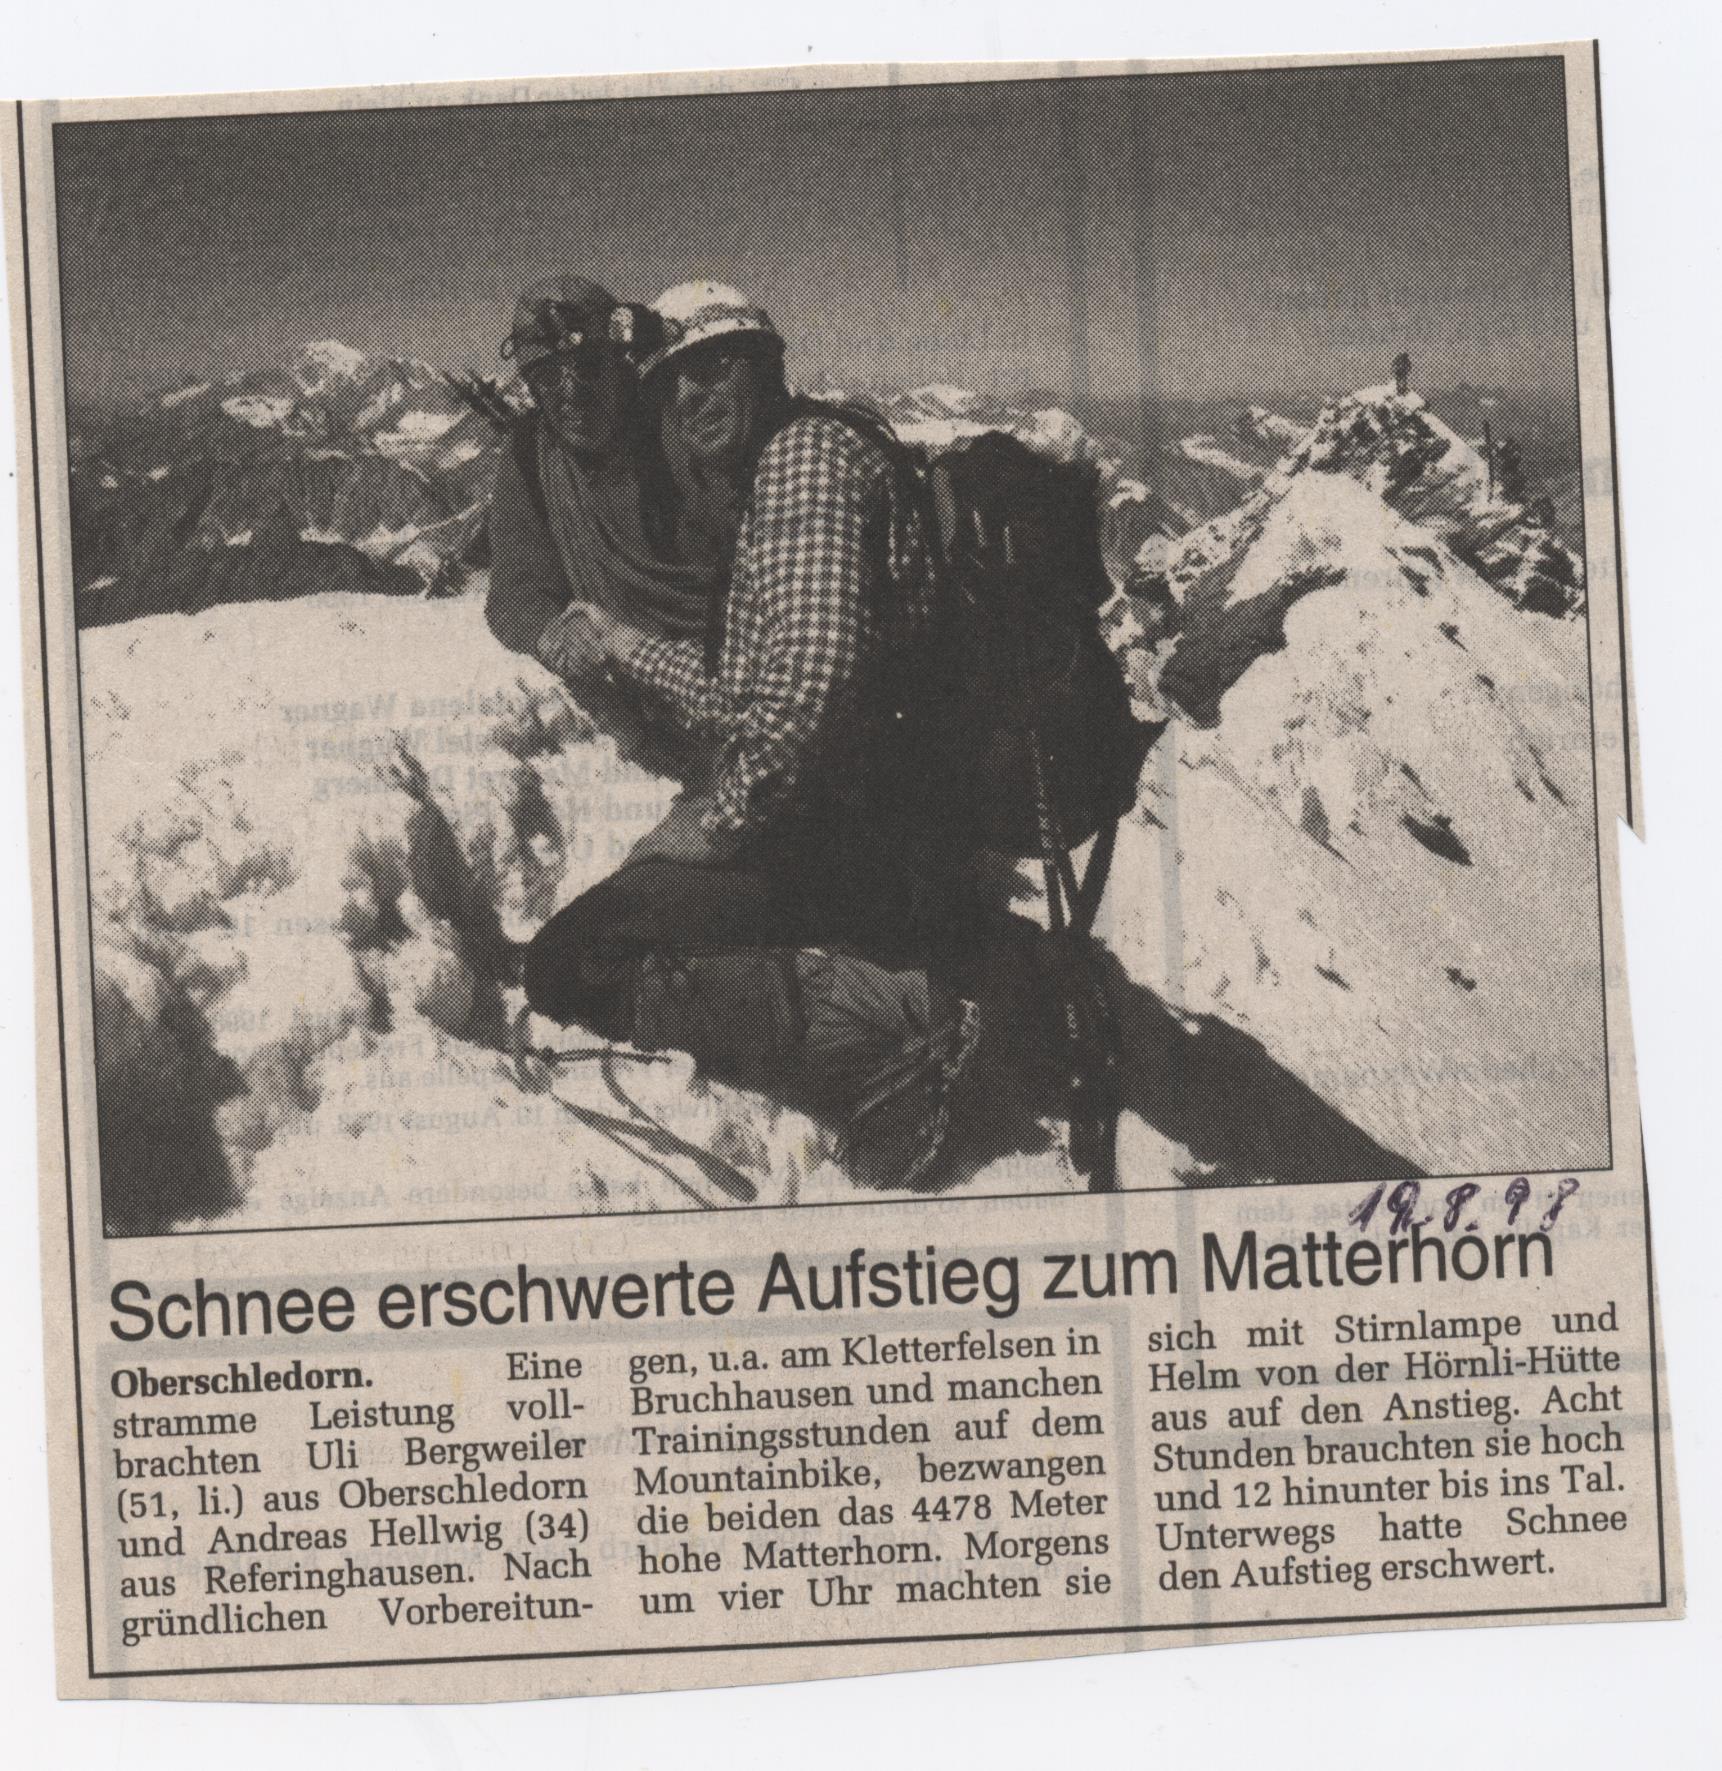 Schenn erschwerte Aufstieg zum Matterhorn